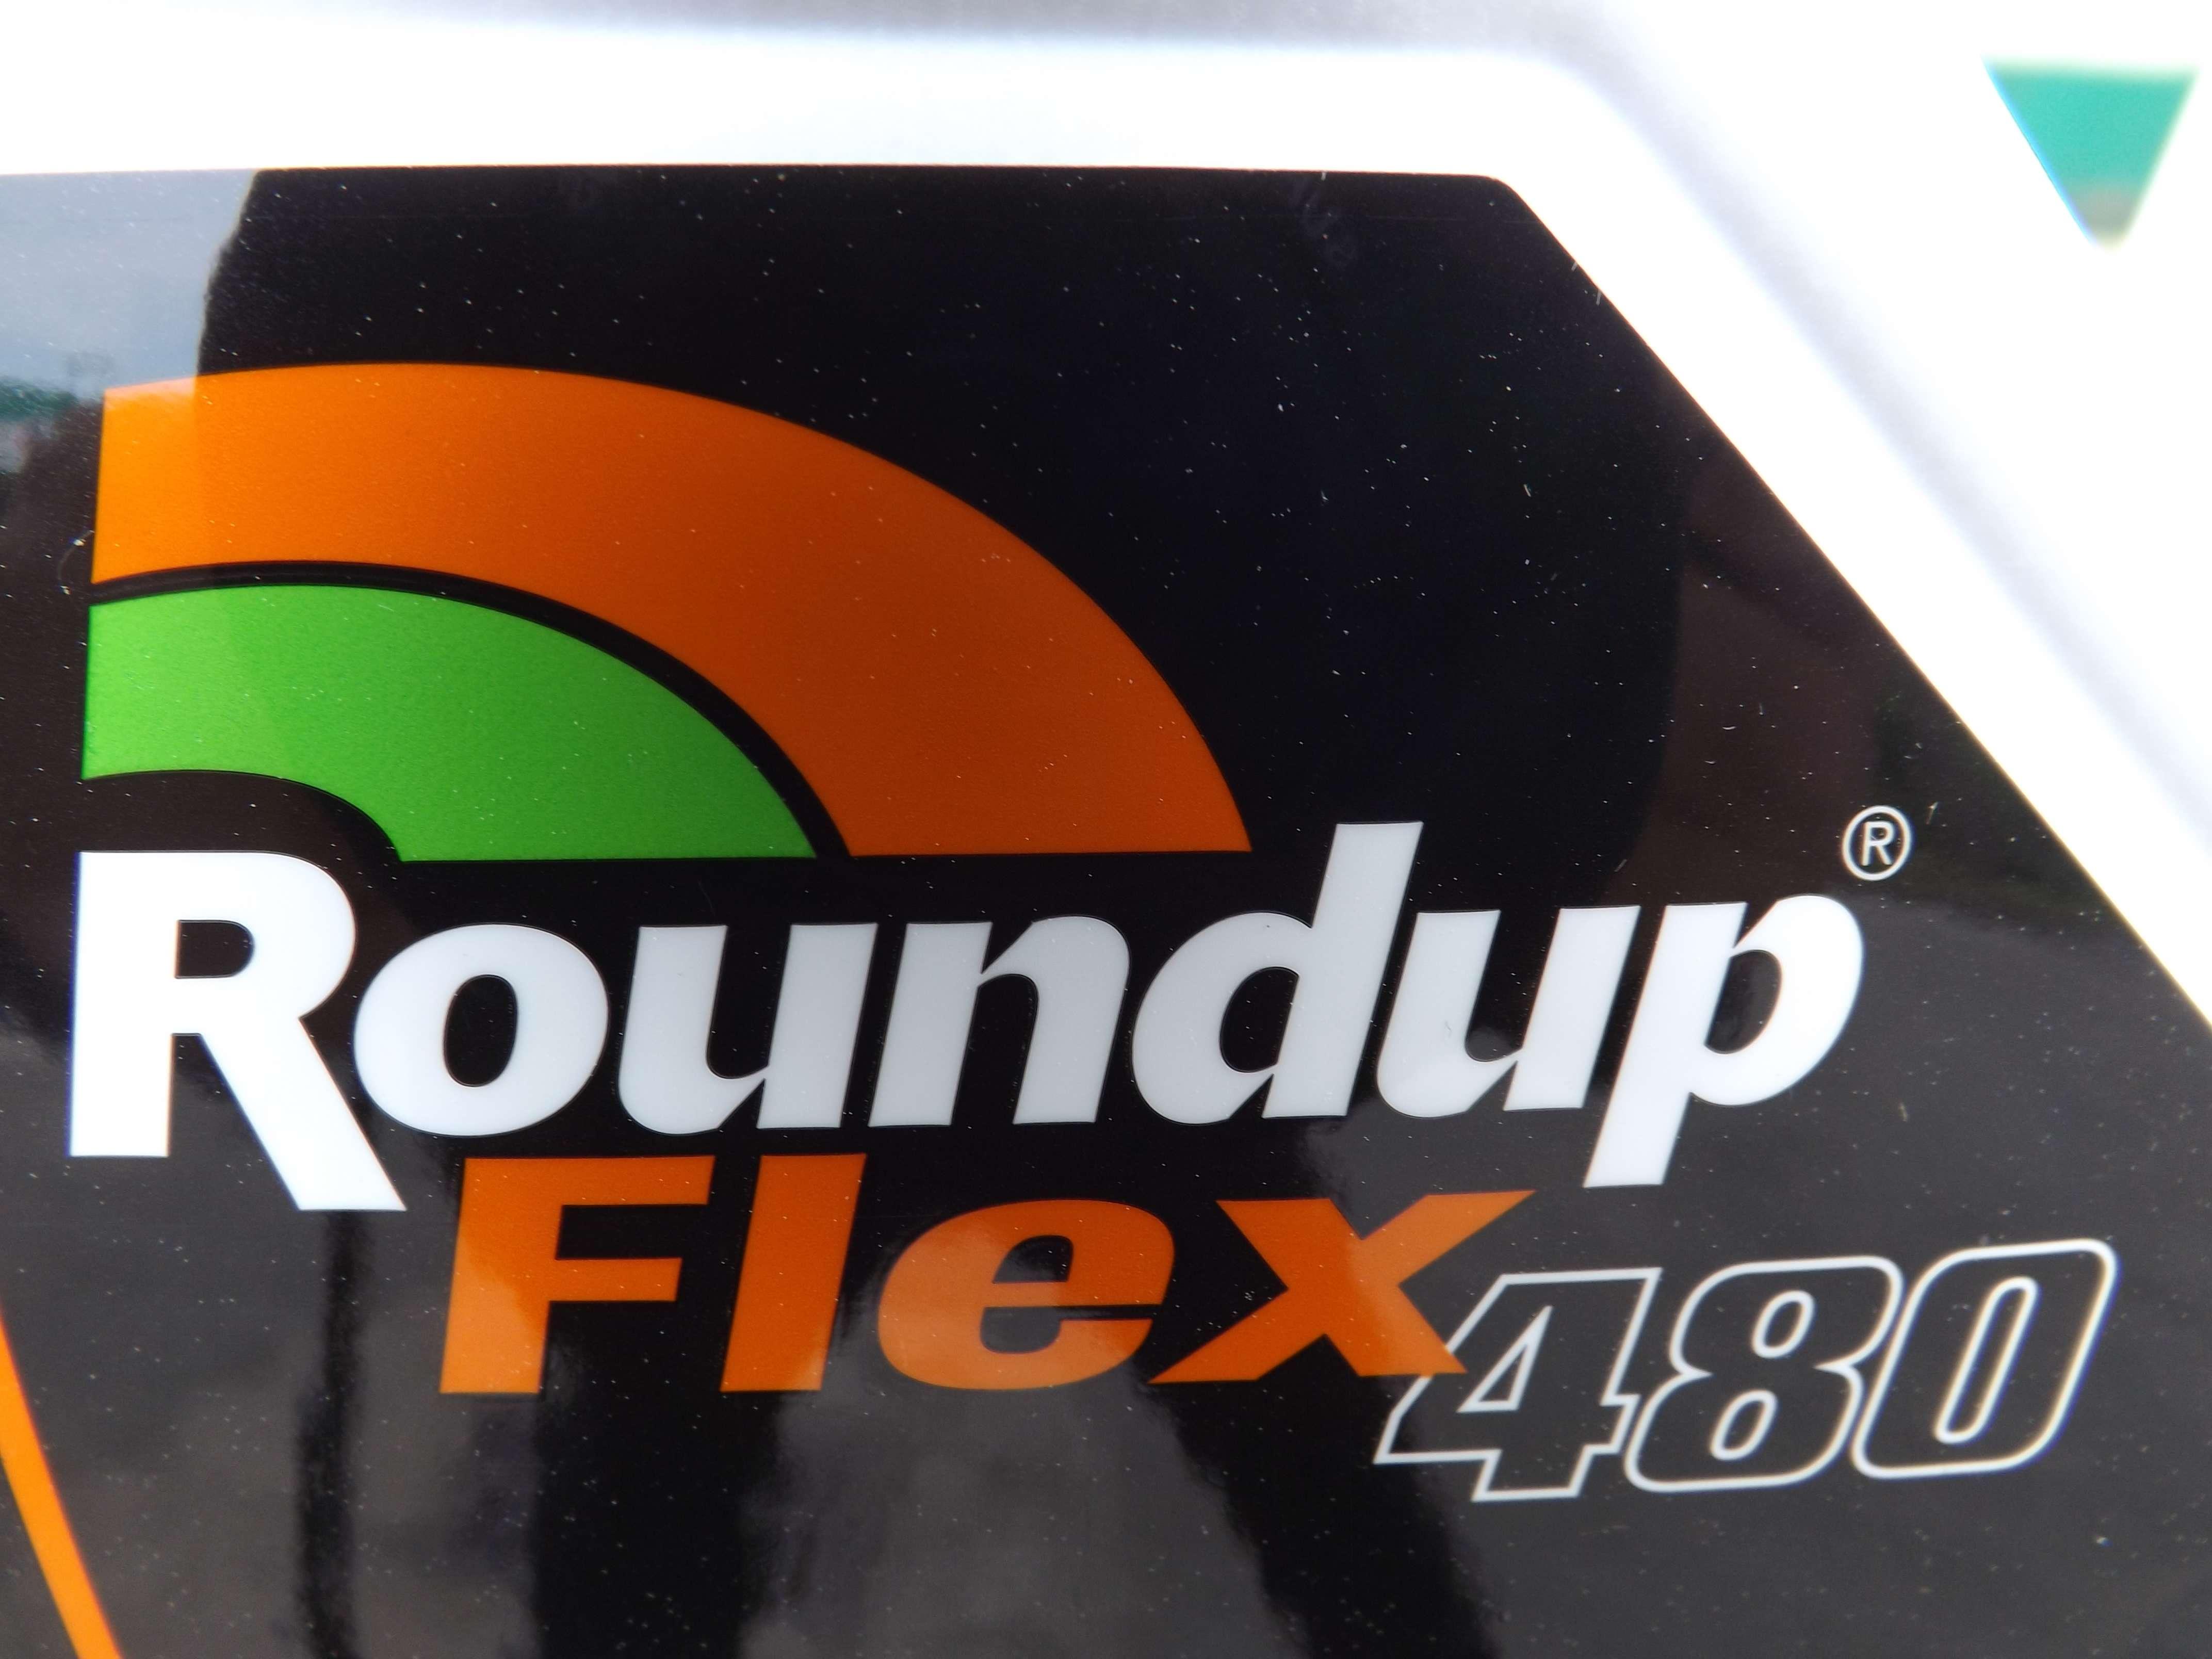 Set 5l Roundup Flex 480 Powerflex Platinum Handschuhe